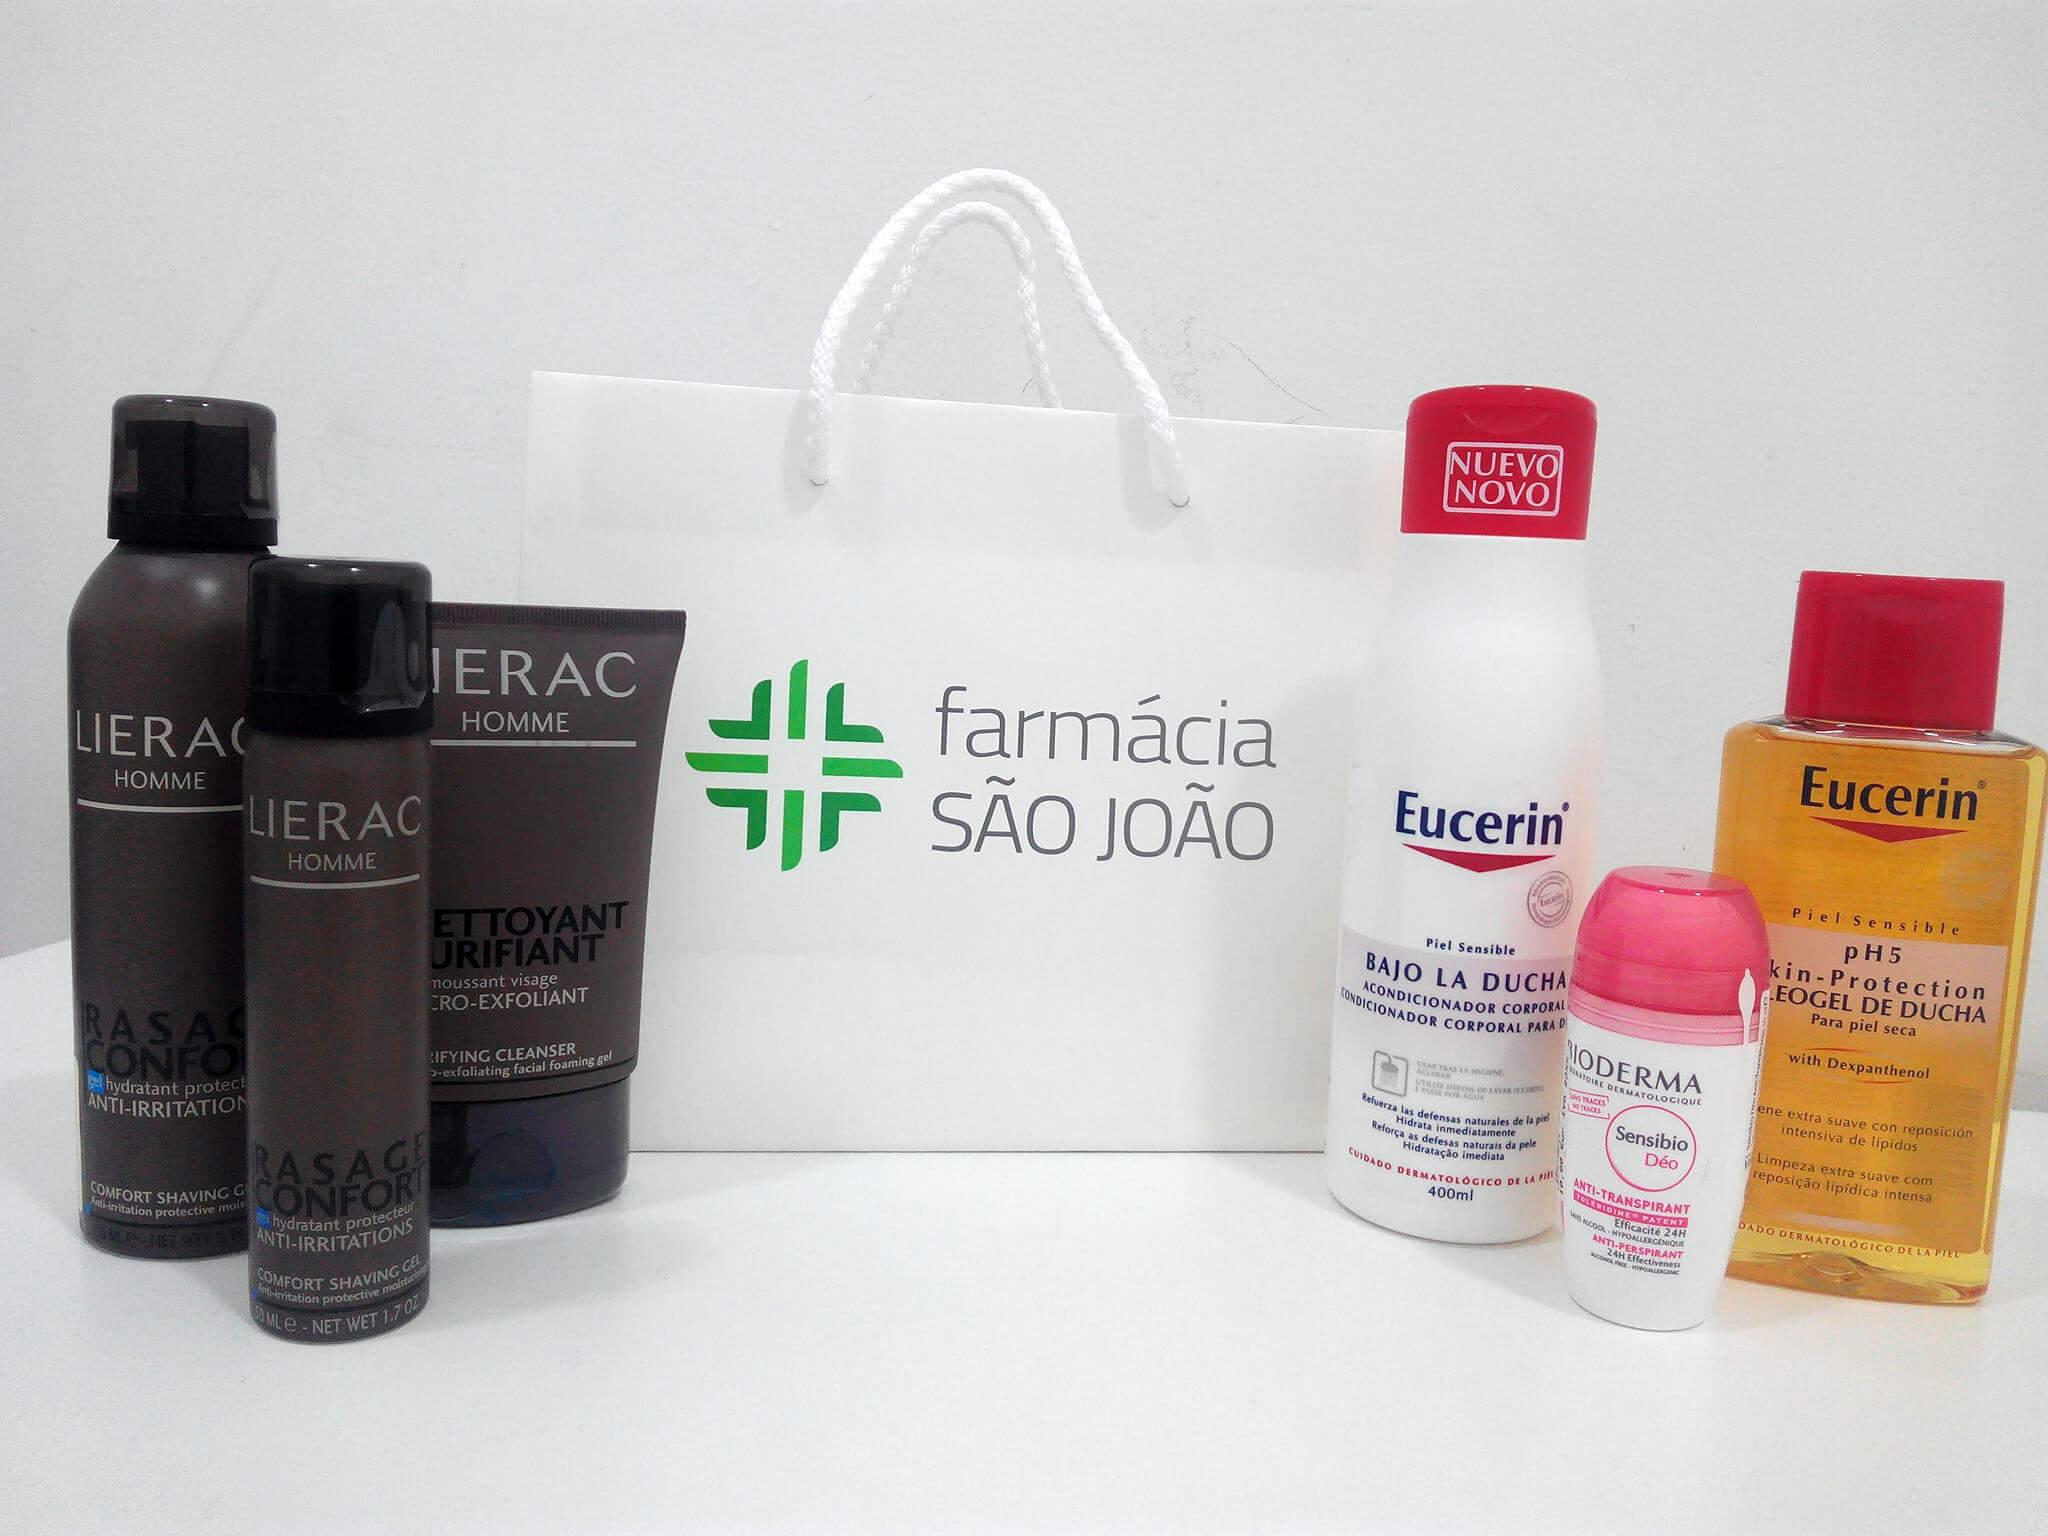 farmácia são joão farmácia são joão Farmácia São João | Design Gráfico farm  cia s  o jo  o1